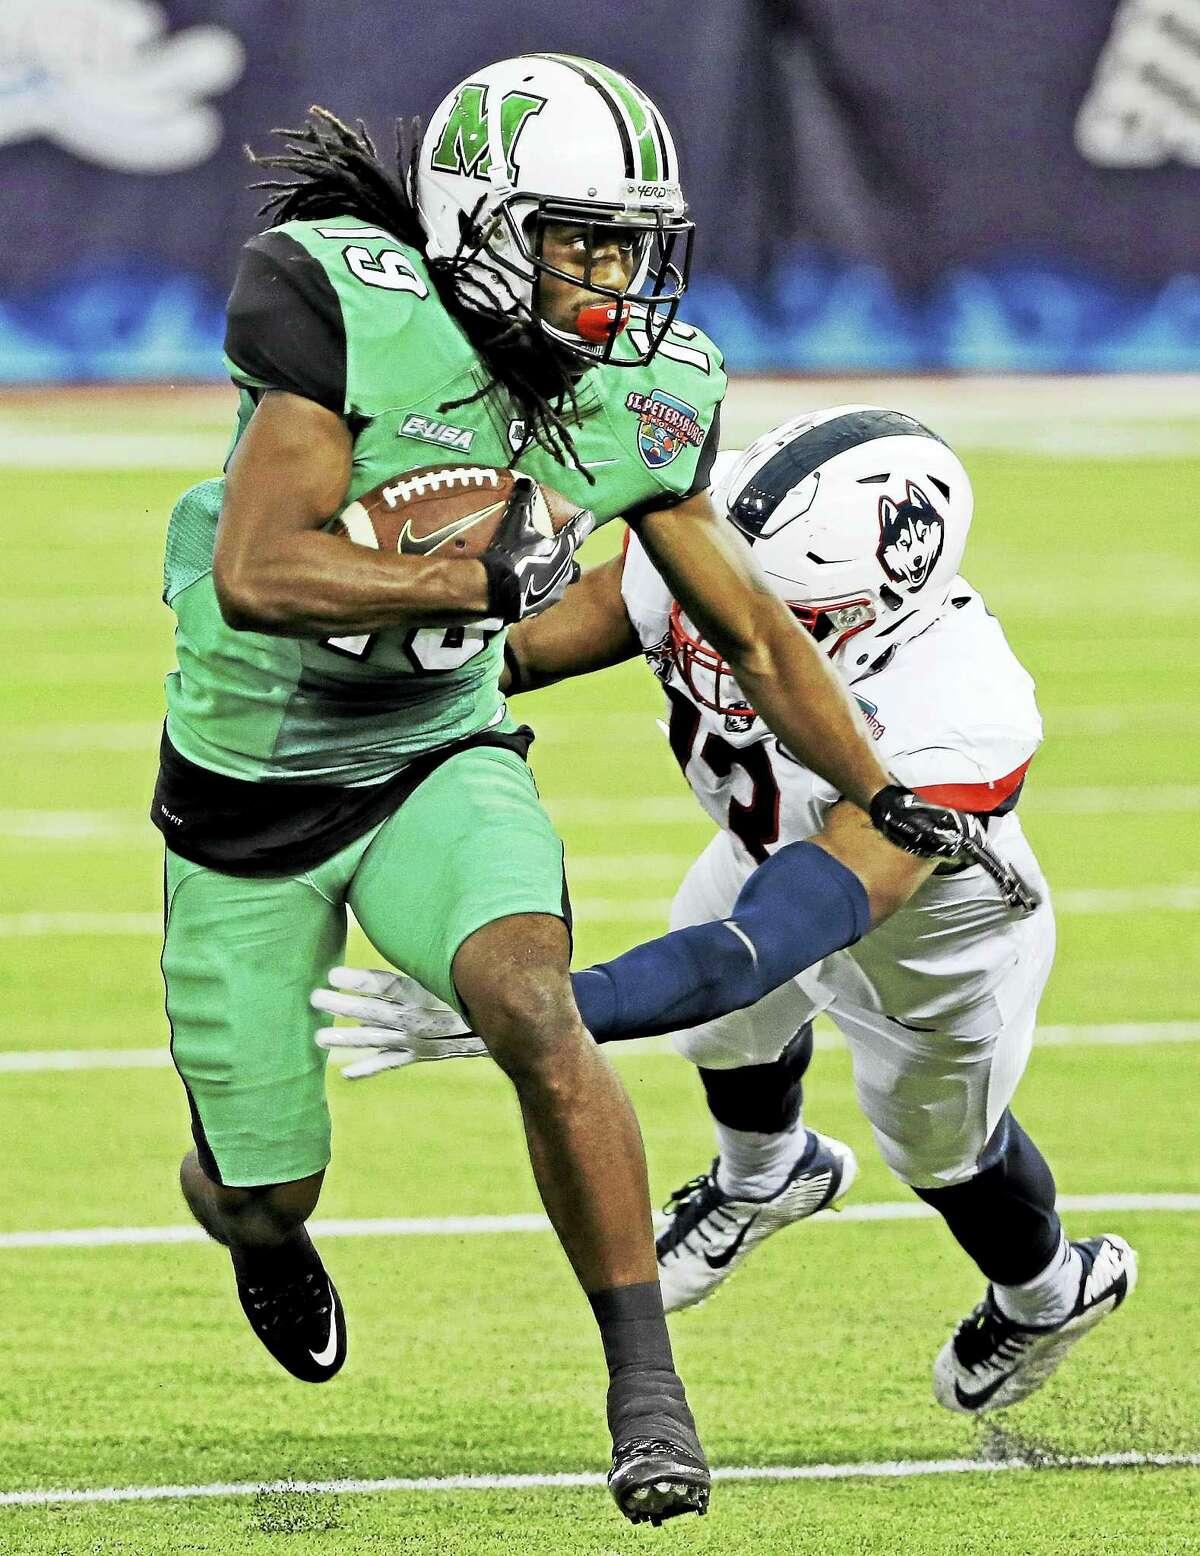 UConn linebacker Vontae Diggs tackles Marshall wide receiver Deandre Reaves during the St. Petersburg Bowl last December.